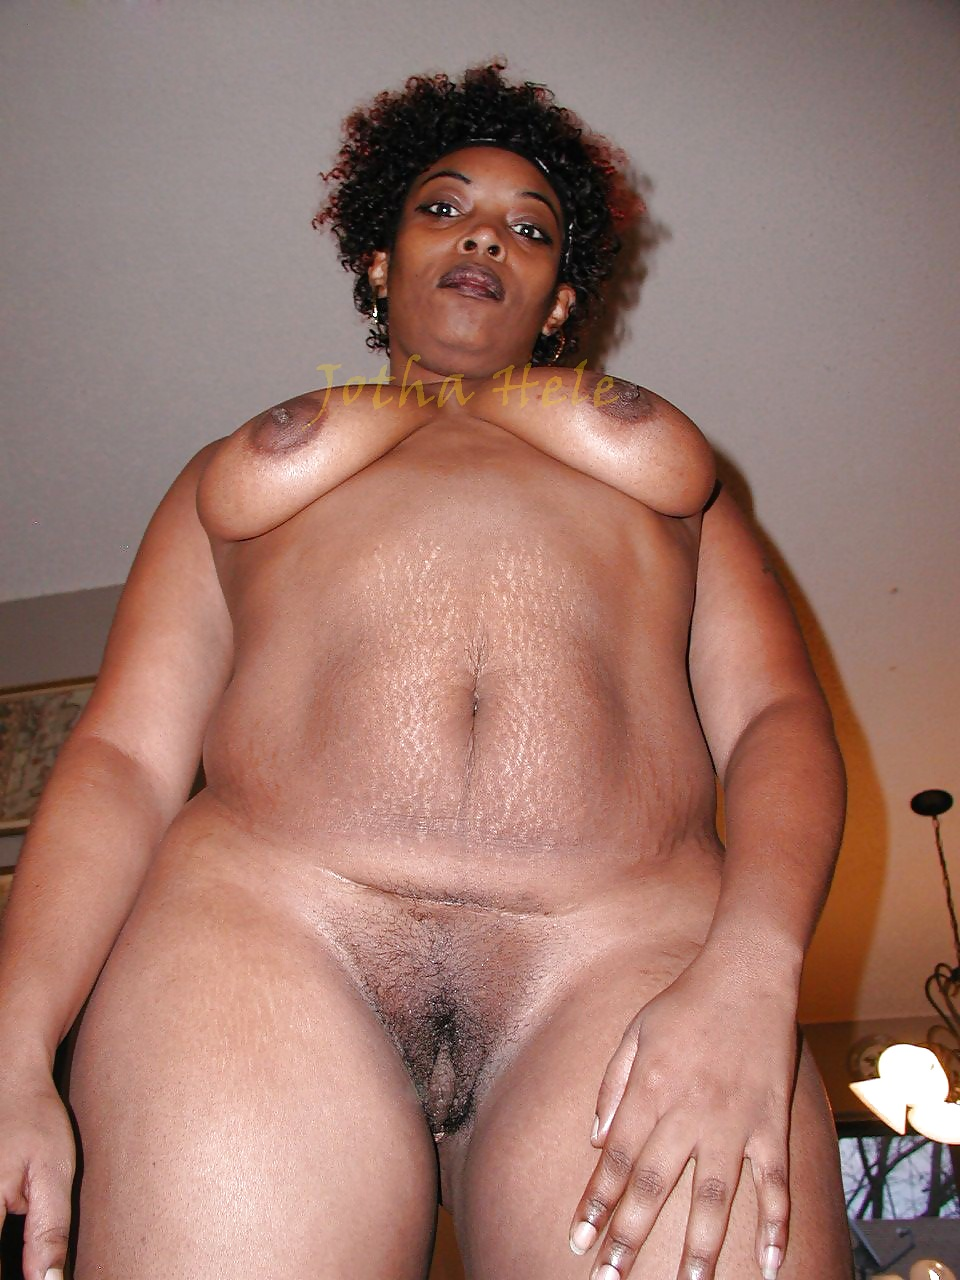 Hairy nudist bbw b! ack women